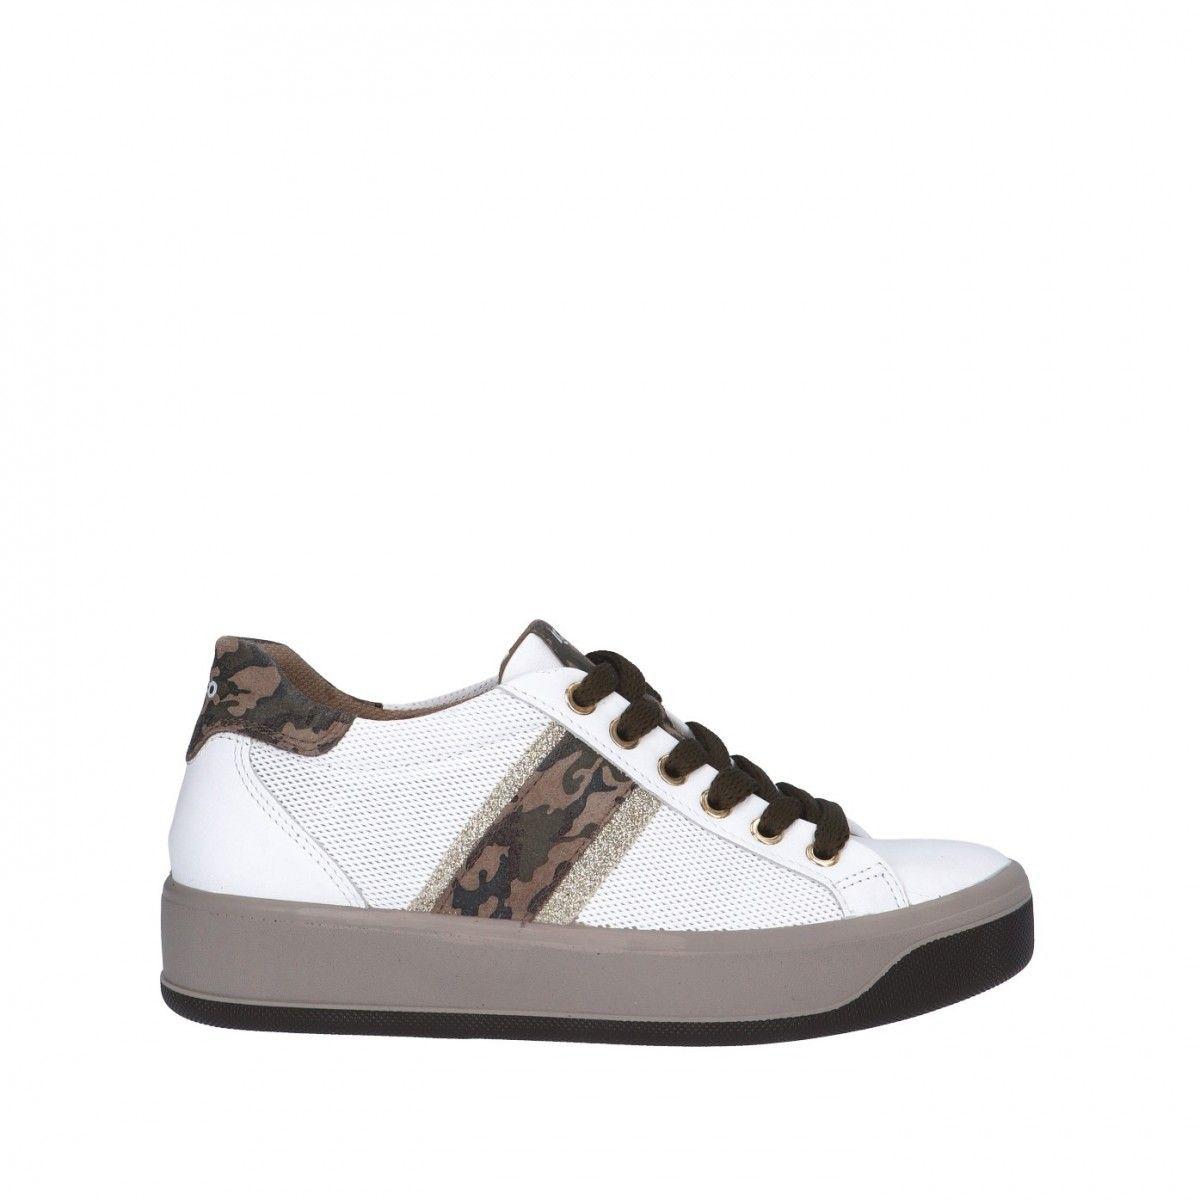 Igi&co Sneaker Bianco Gomma...